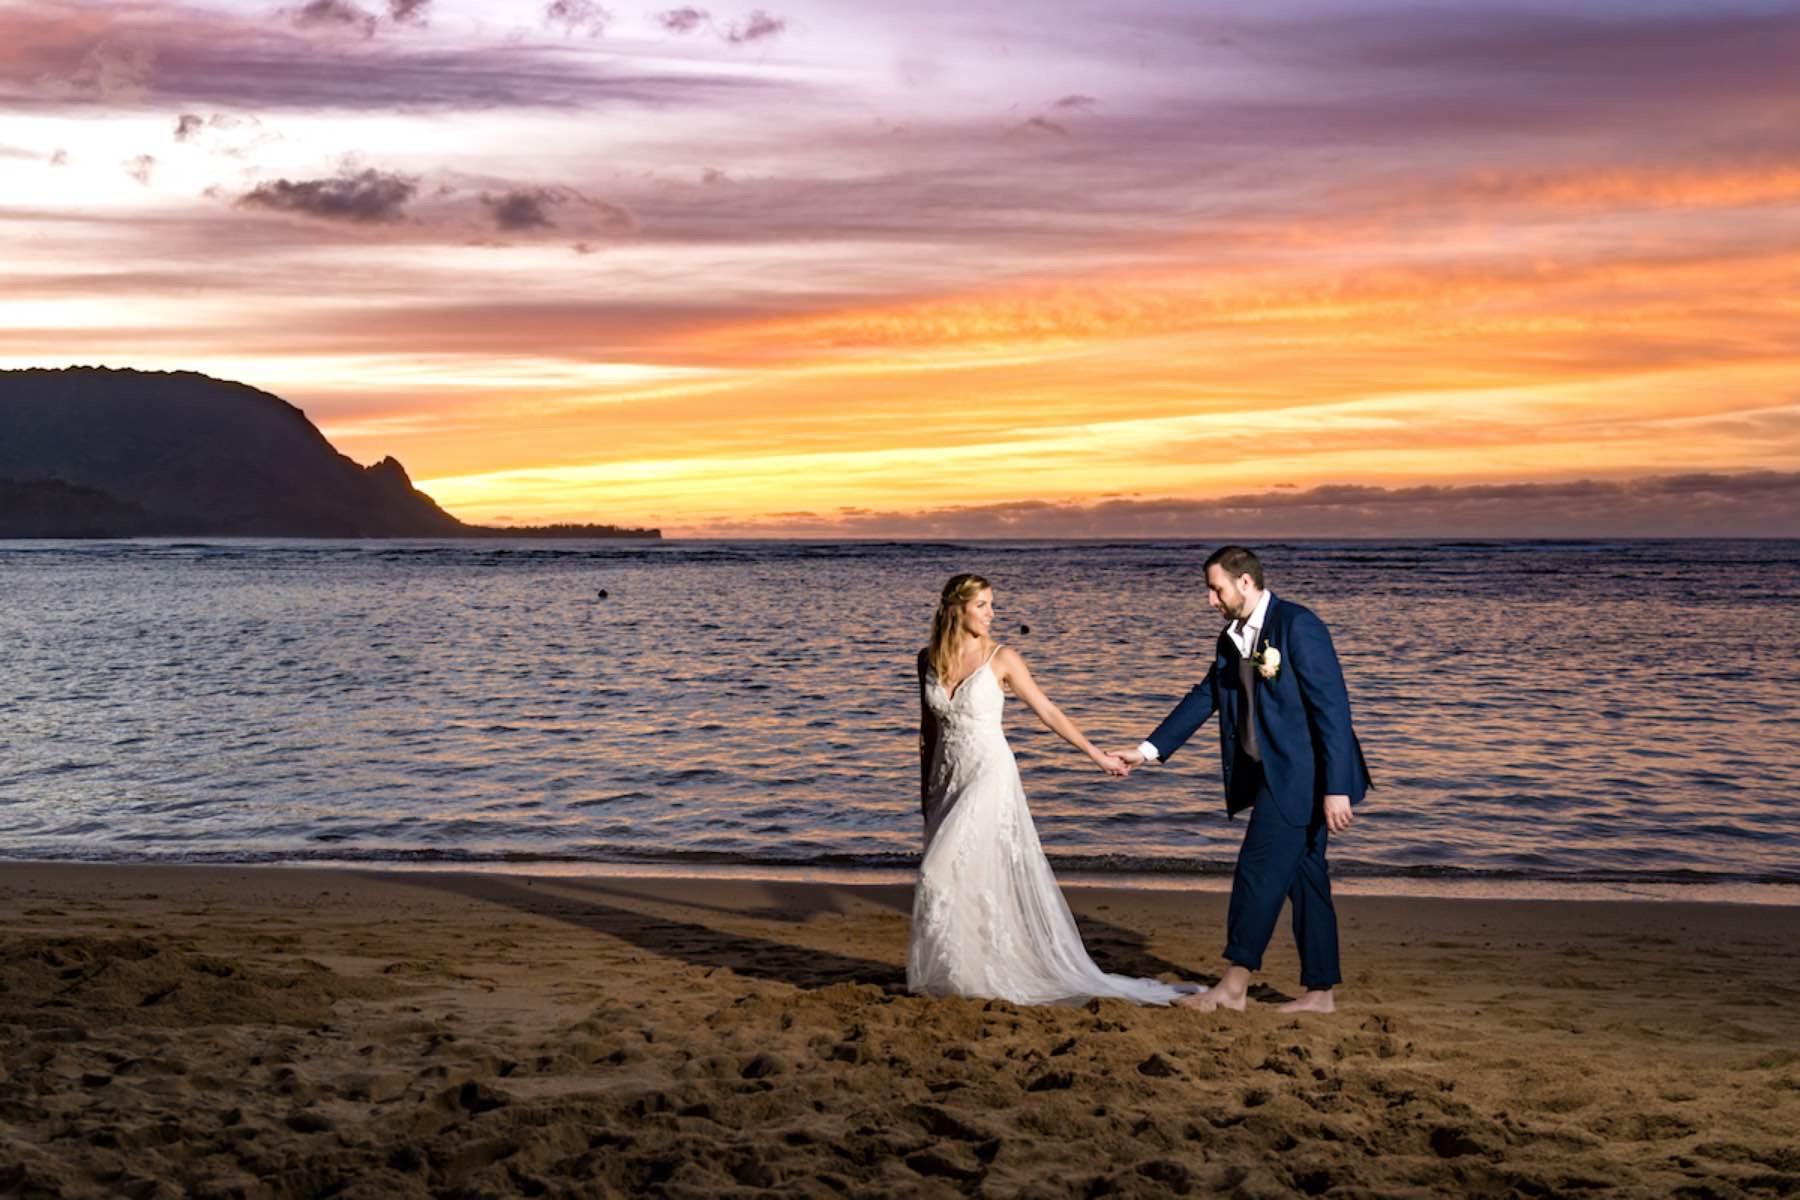 Sarah & Brian on Hawaiian beach at sunset.